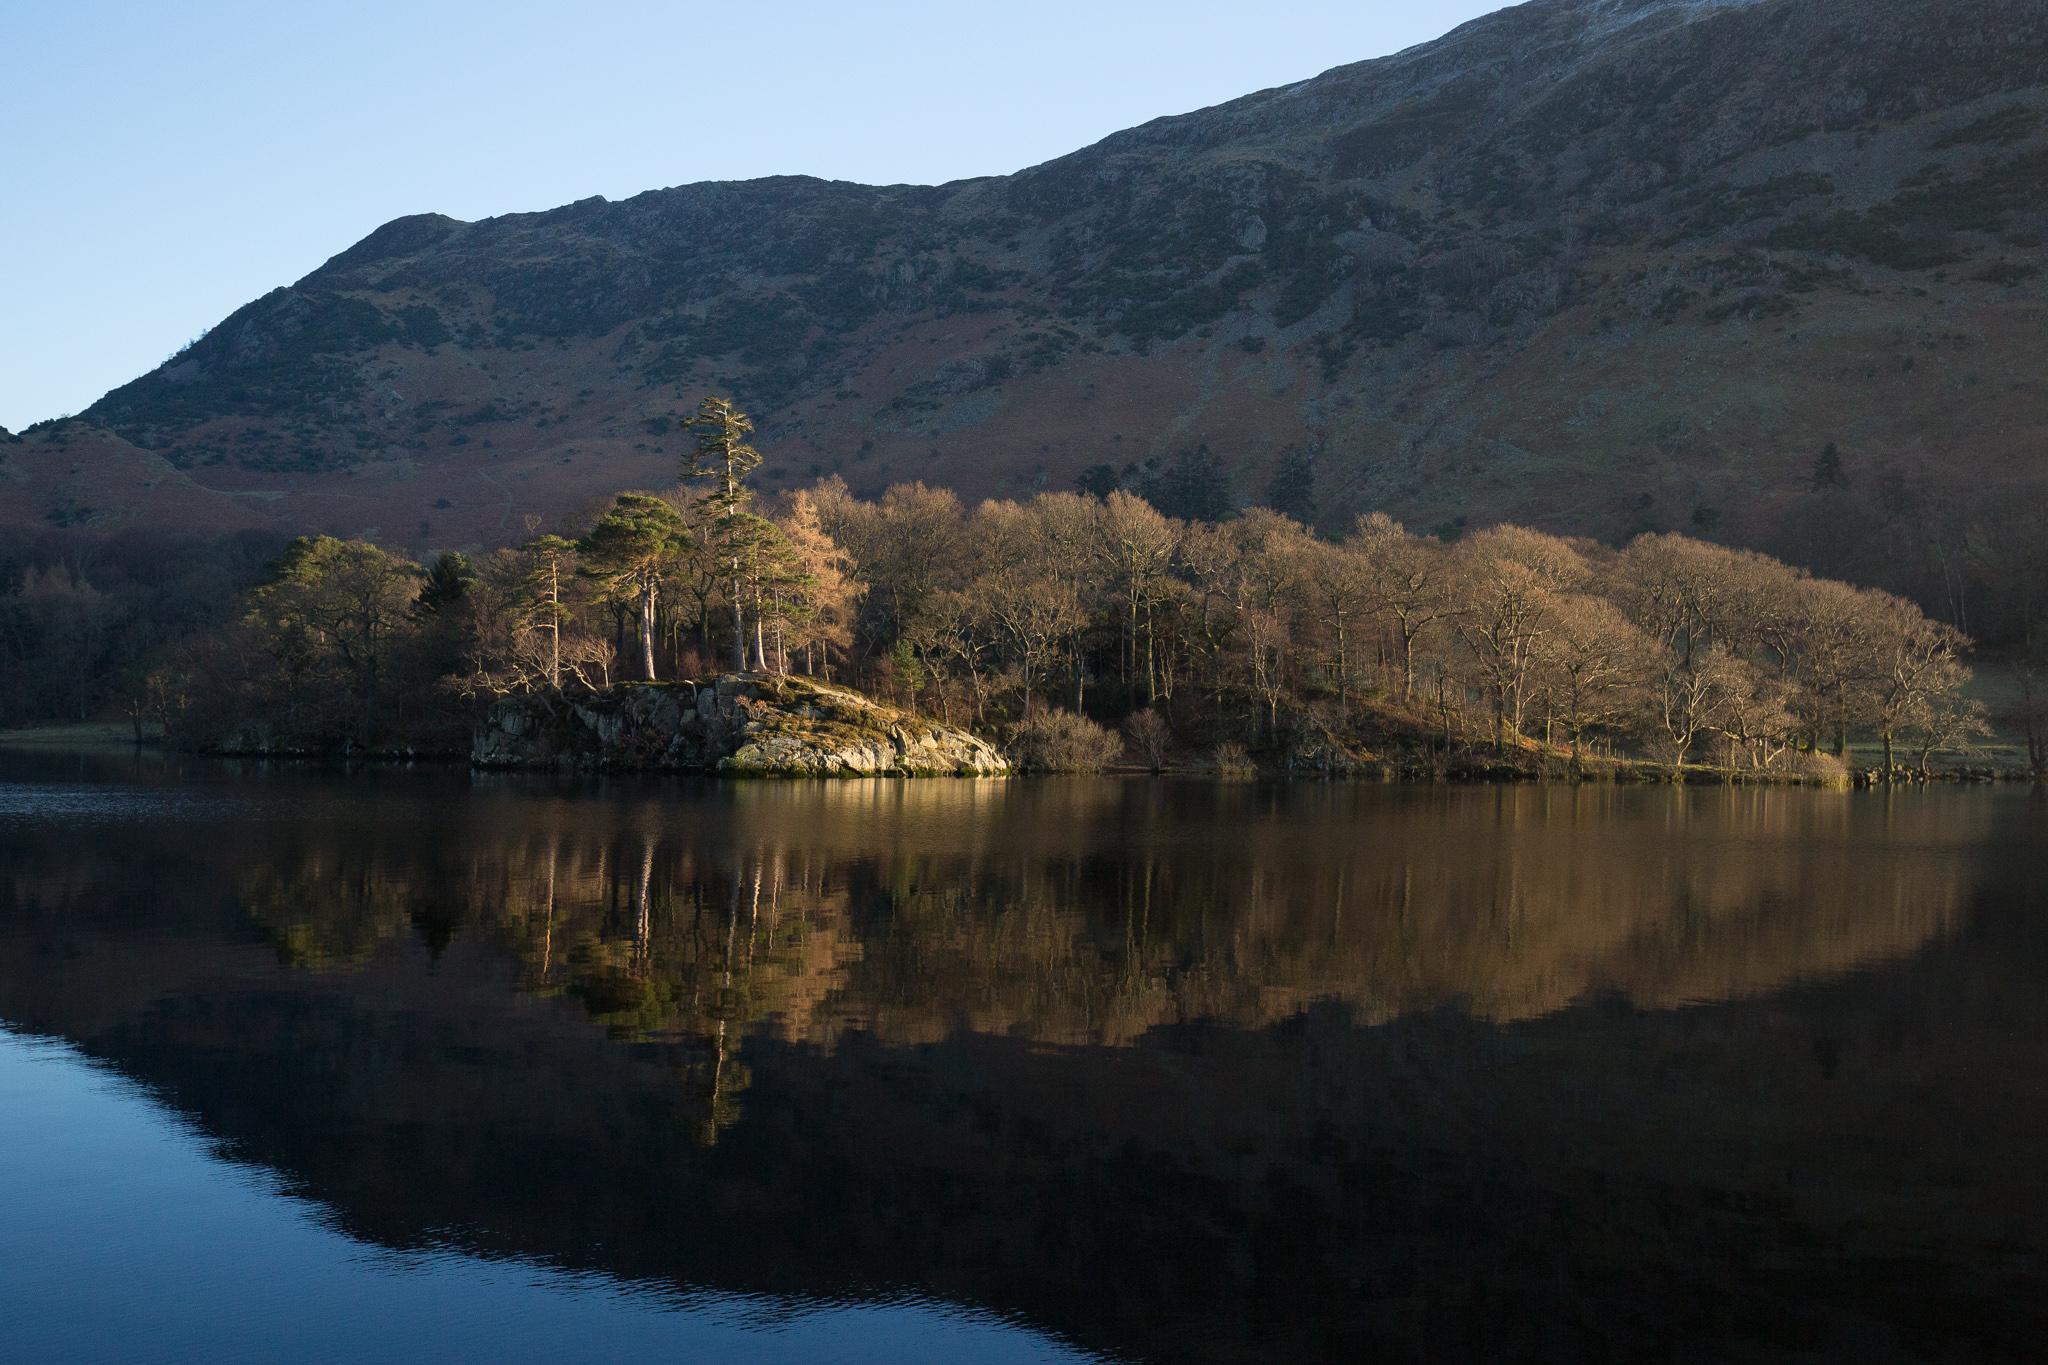 2645-uk-award-winning-landscape-photography.jpg